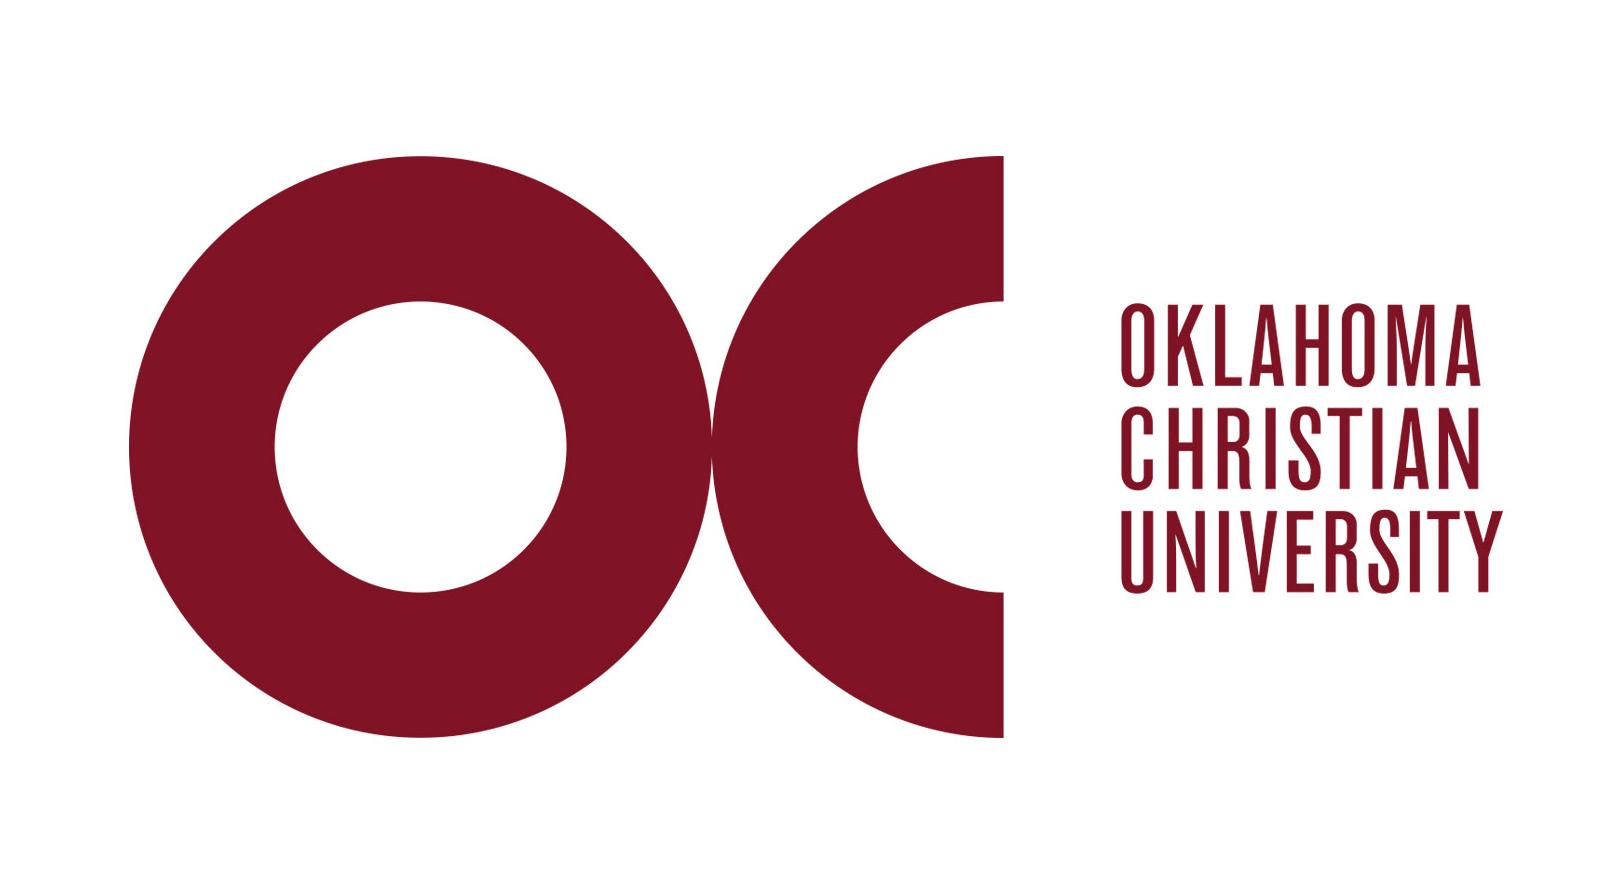 Brand New New Logo And Identity For Oklahoma Christian University By Switch Identity Logo Information Overload University Architecture